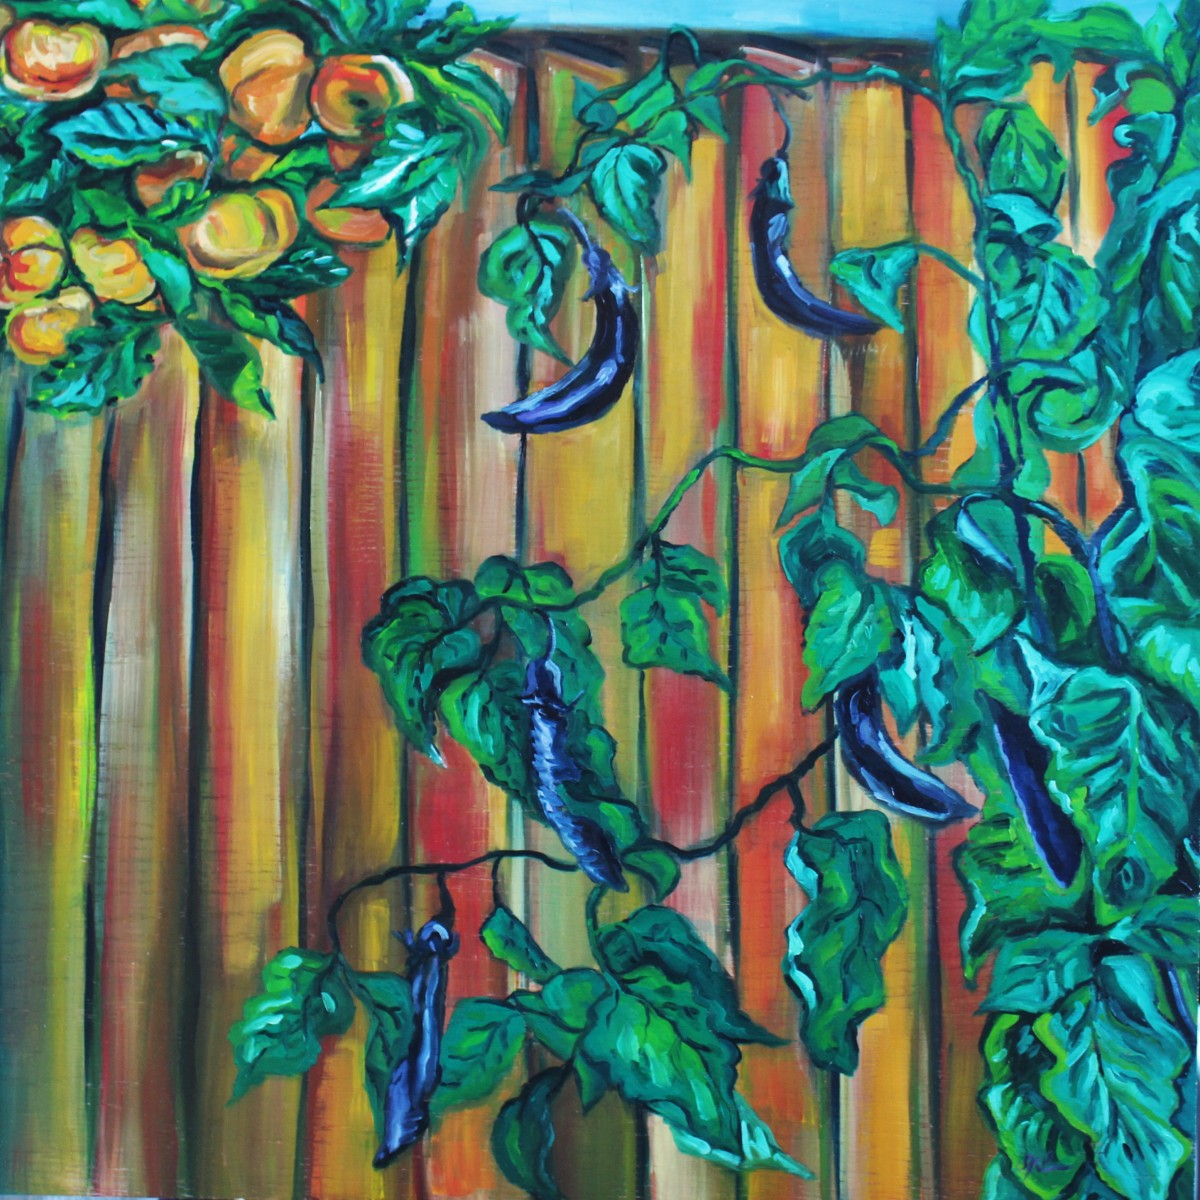 Eggplants and Persimmon Tree by Sonya Kleshik